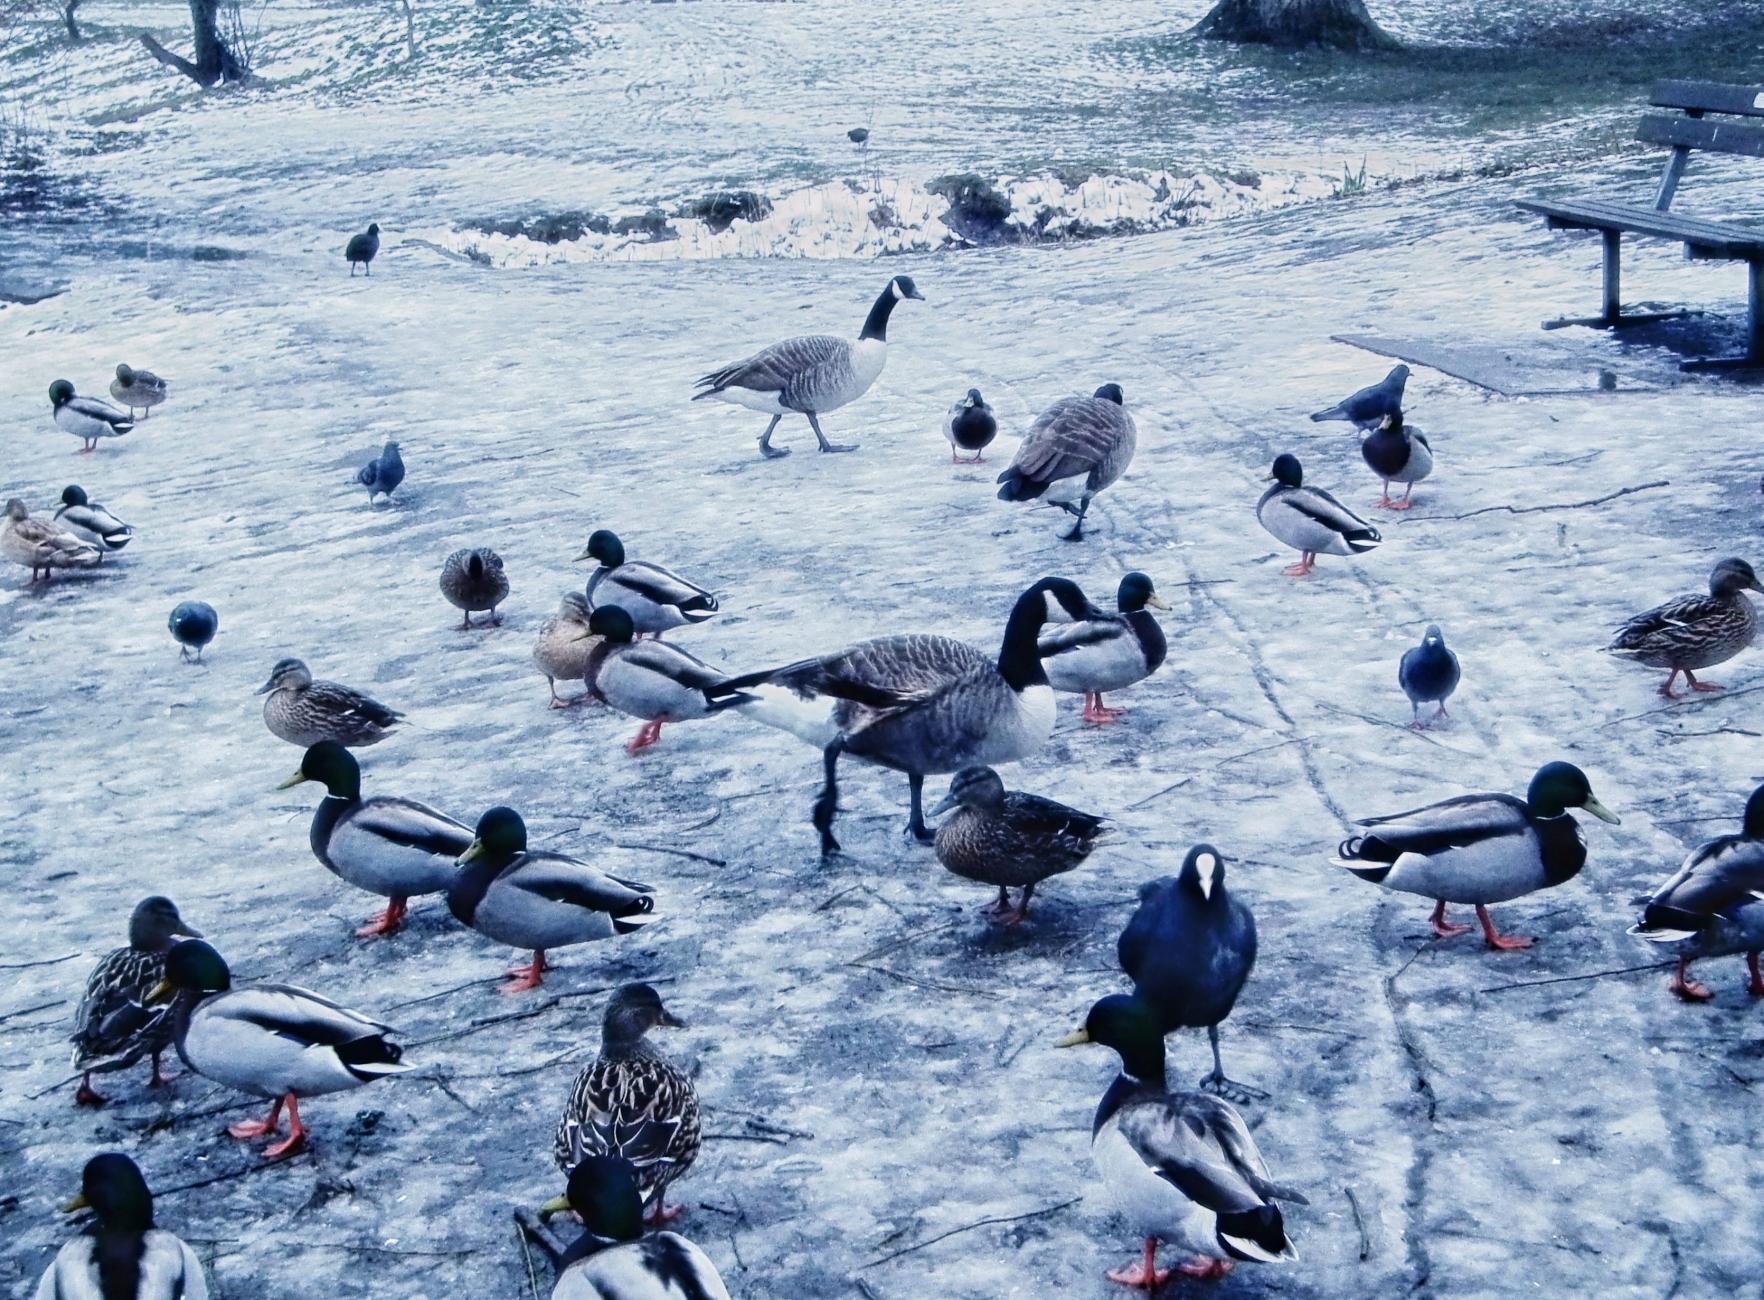 Skating rink for birds